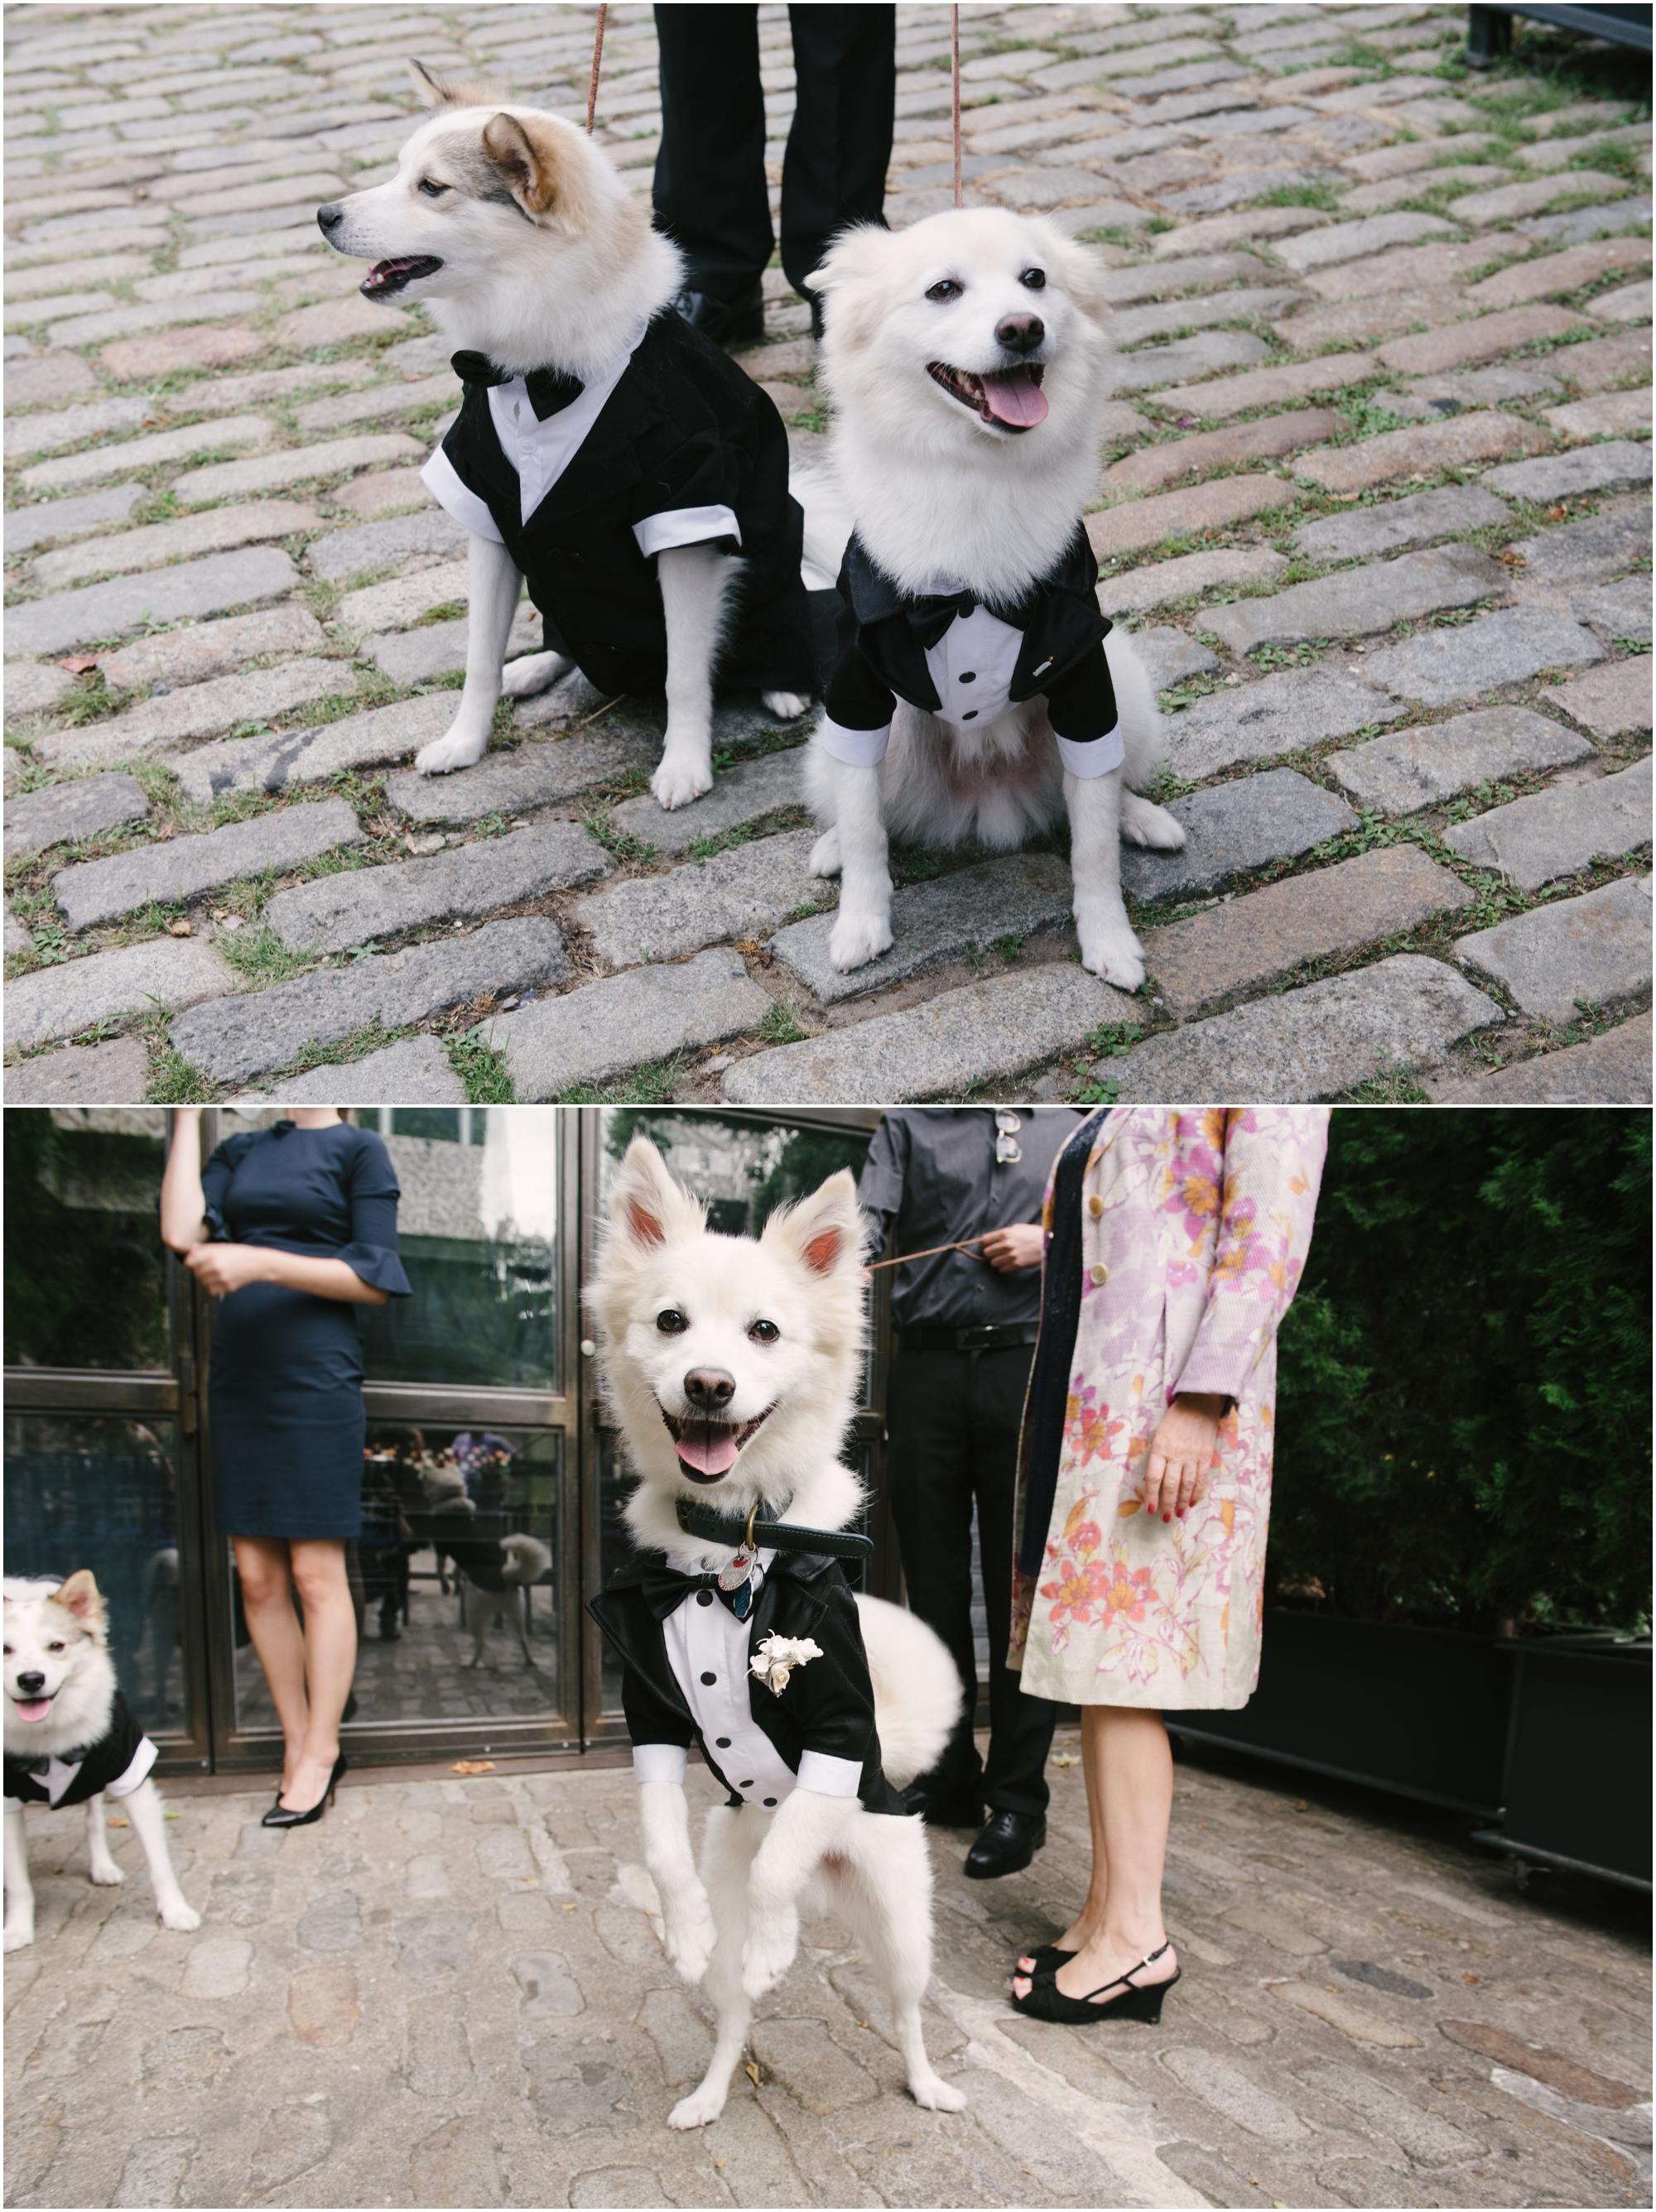 gay-wedding-photographer-williamsburgphotostudios-thefoundry-wedding-photographer_0025.jpg